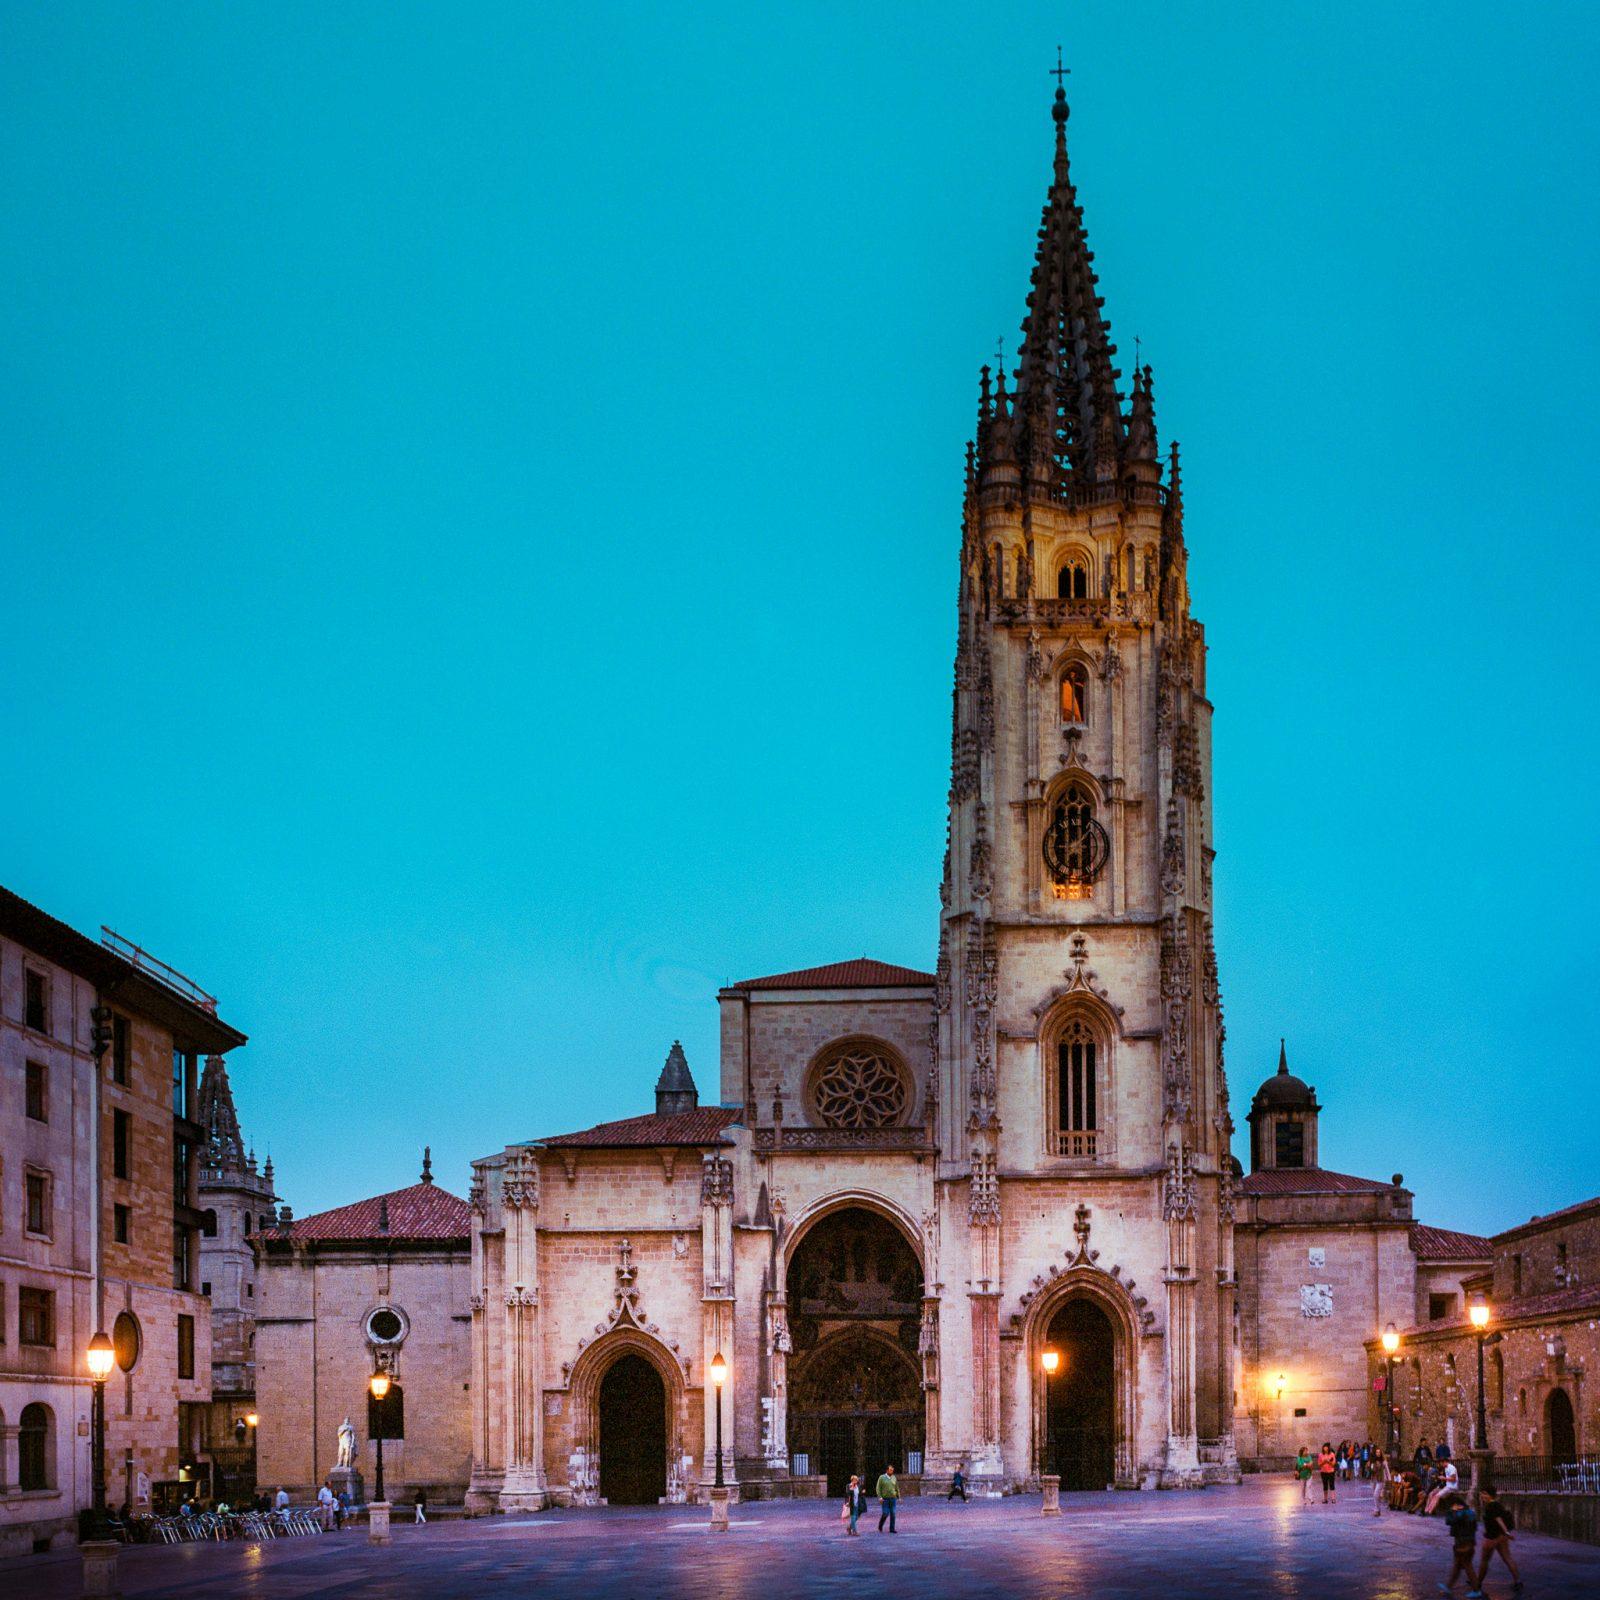 Catedral Metropolitana Basílica de San Salvador